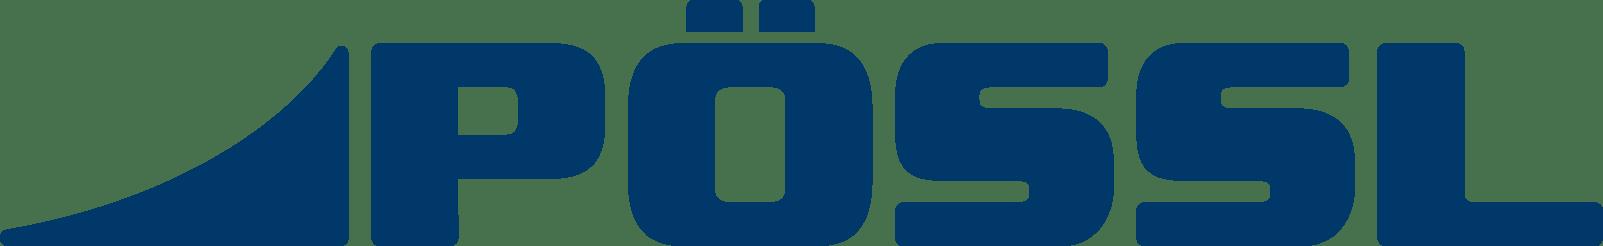 logo_poessl_rgb